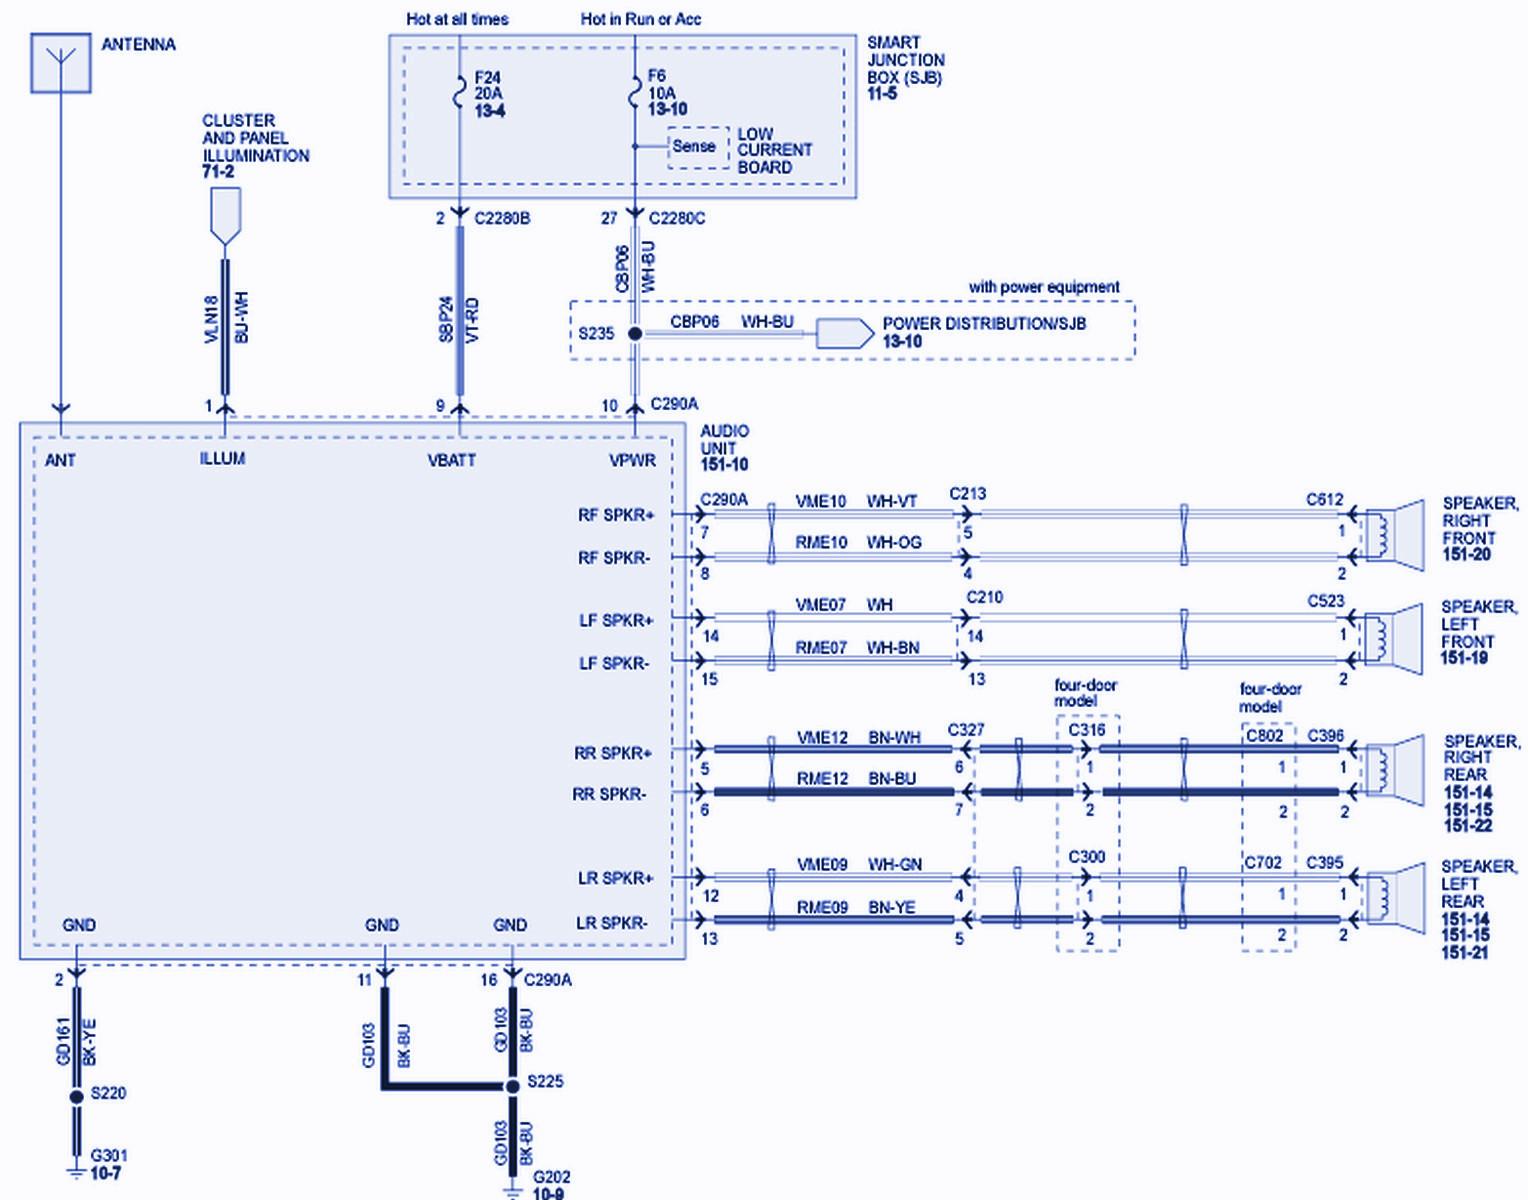 medium resolution of 2010 f350 wiring diagram schema diagram database 2010 ford ranger wiring diagram 2010 f250 wiring diagram